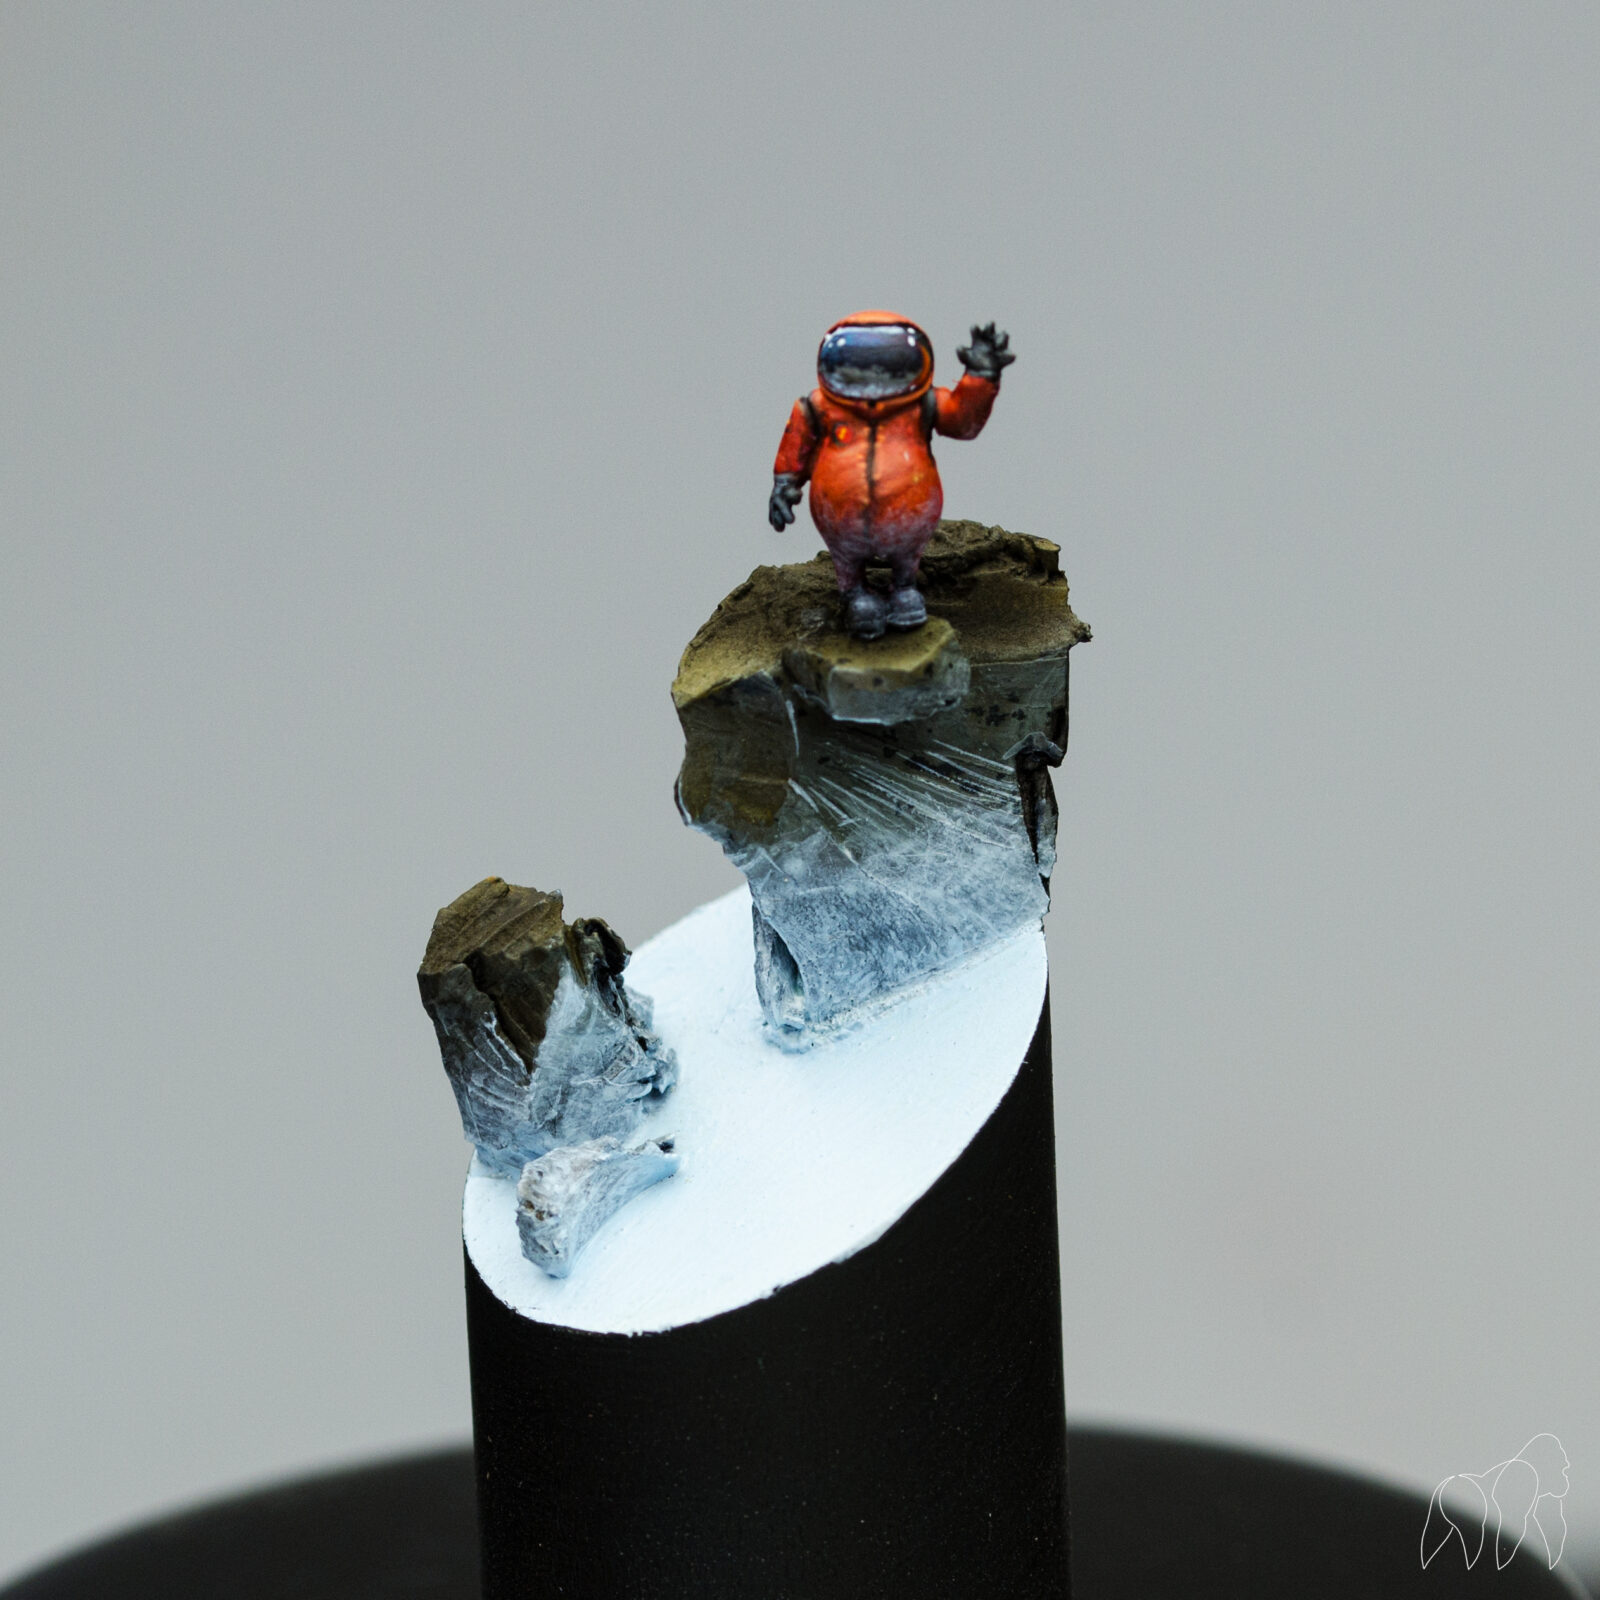 Ogre01